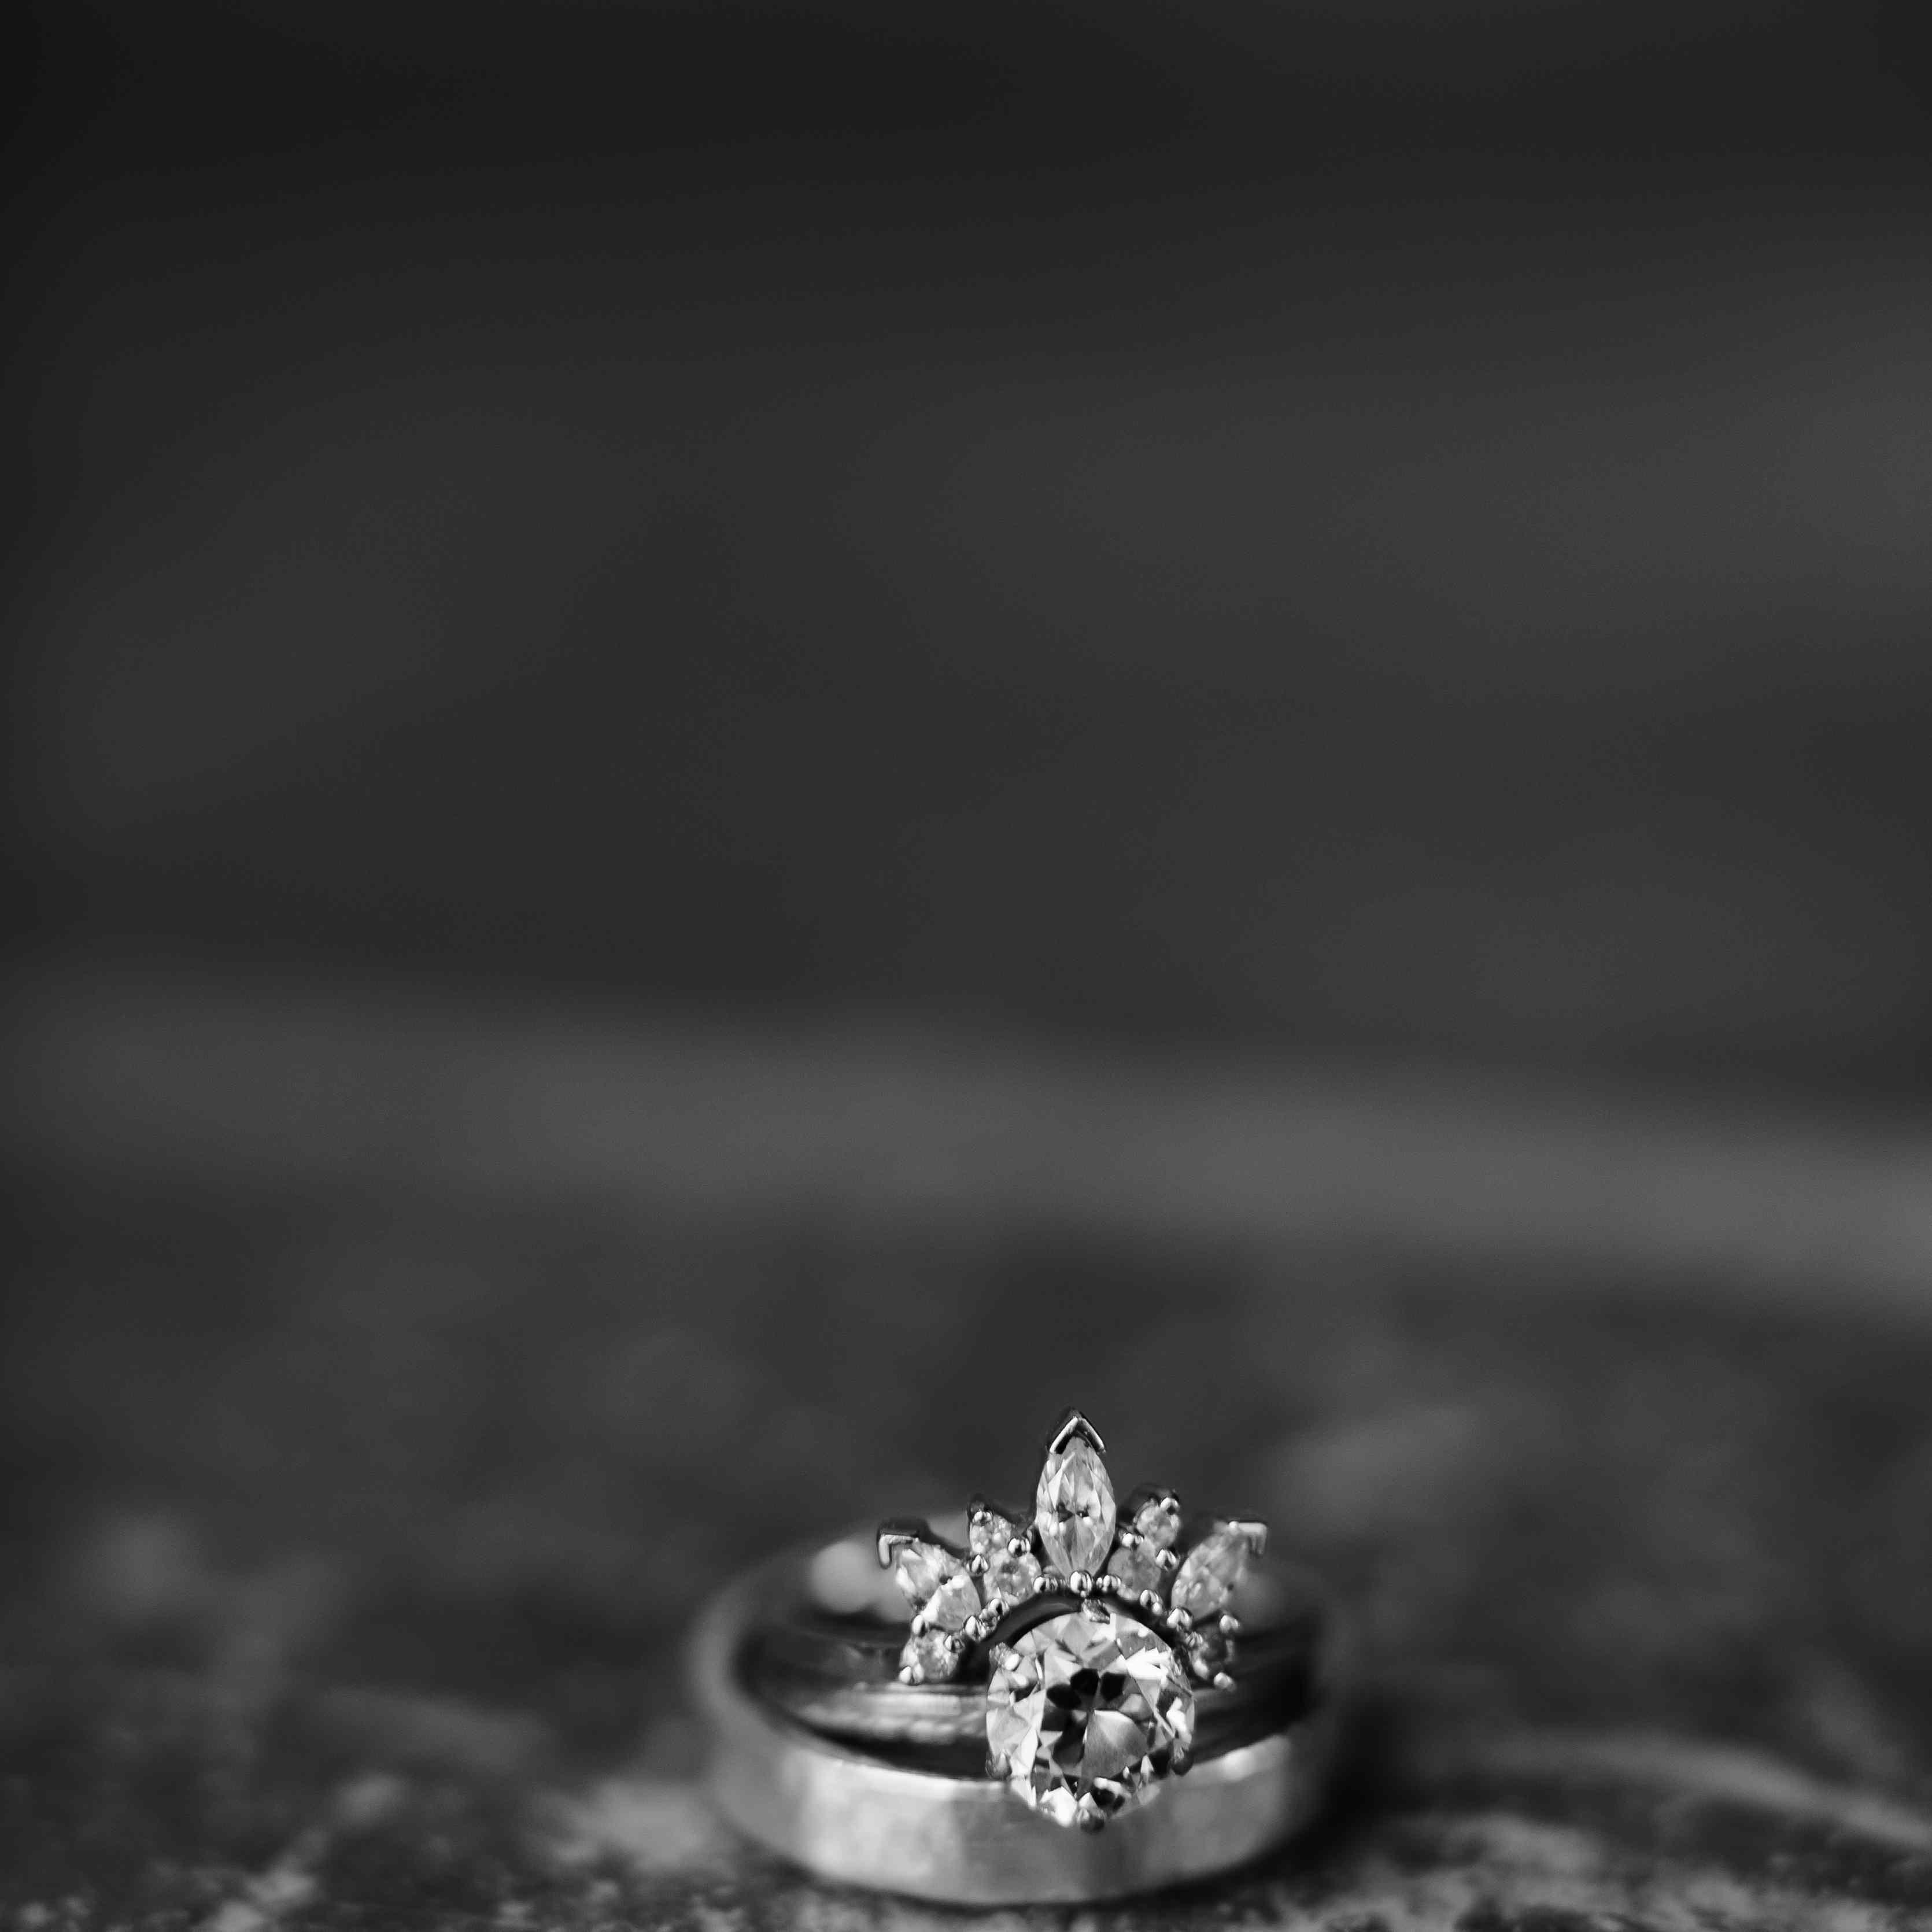 <p>vintage engagement ring</p><br><br>